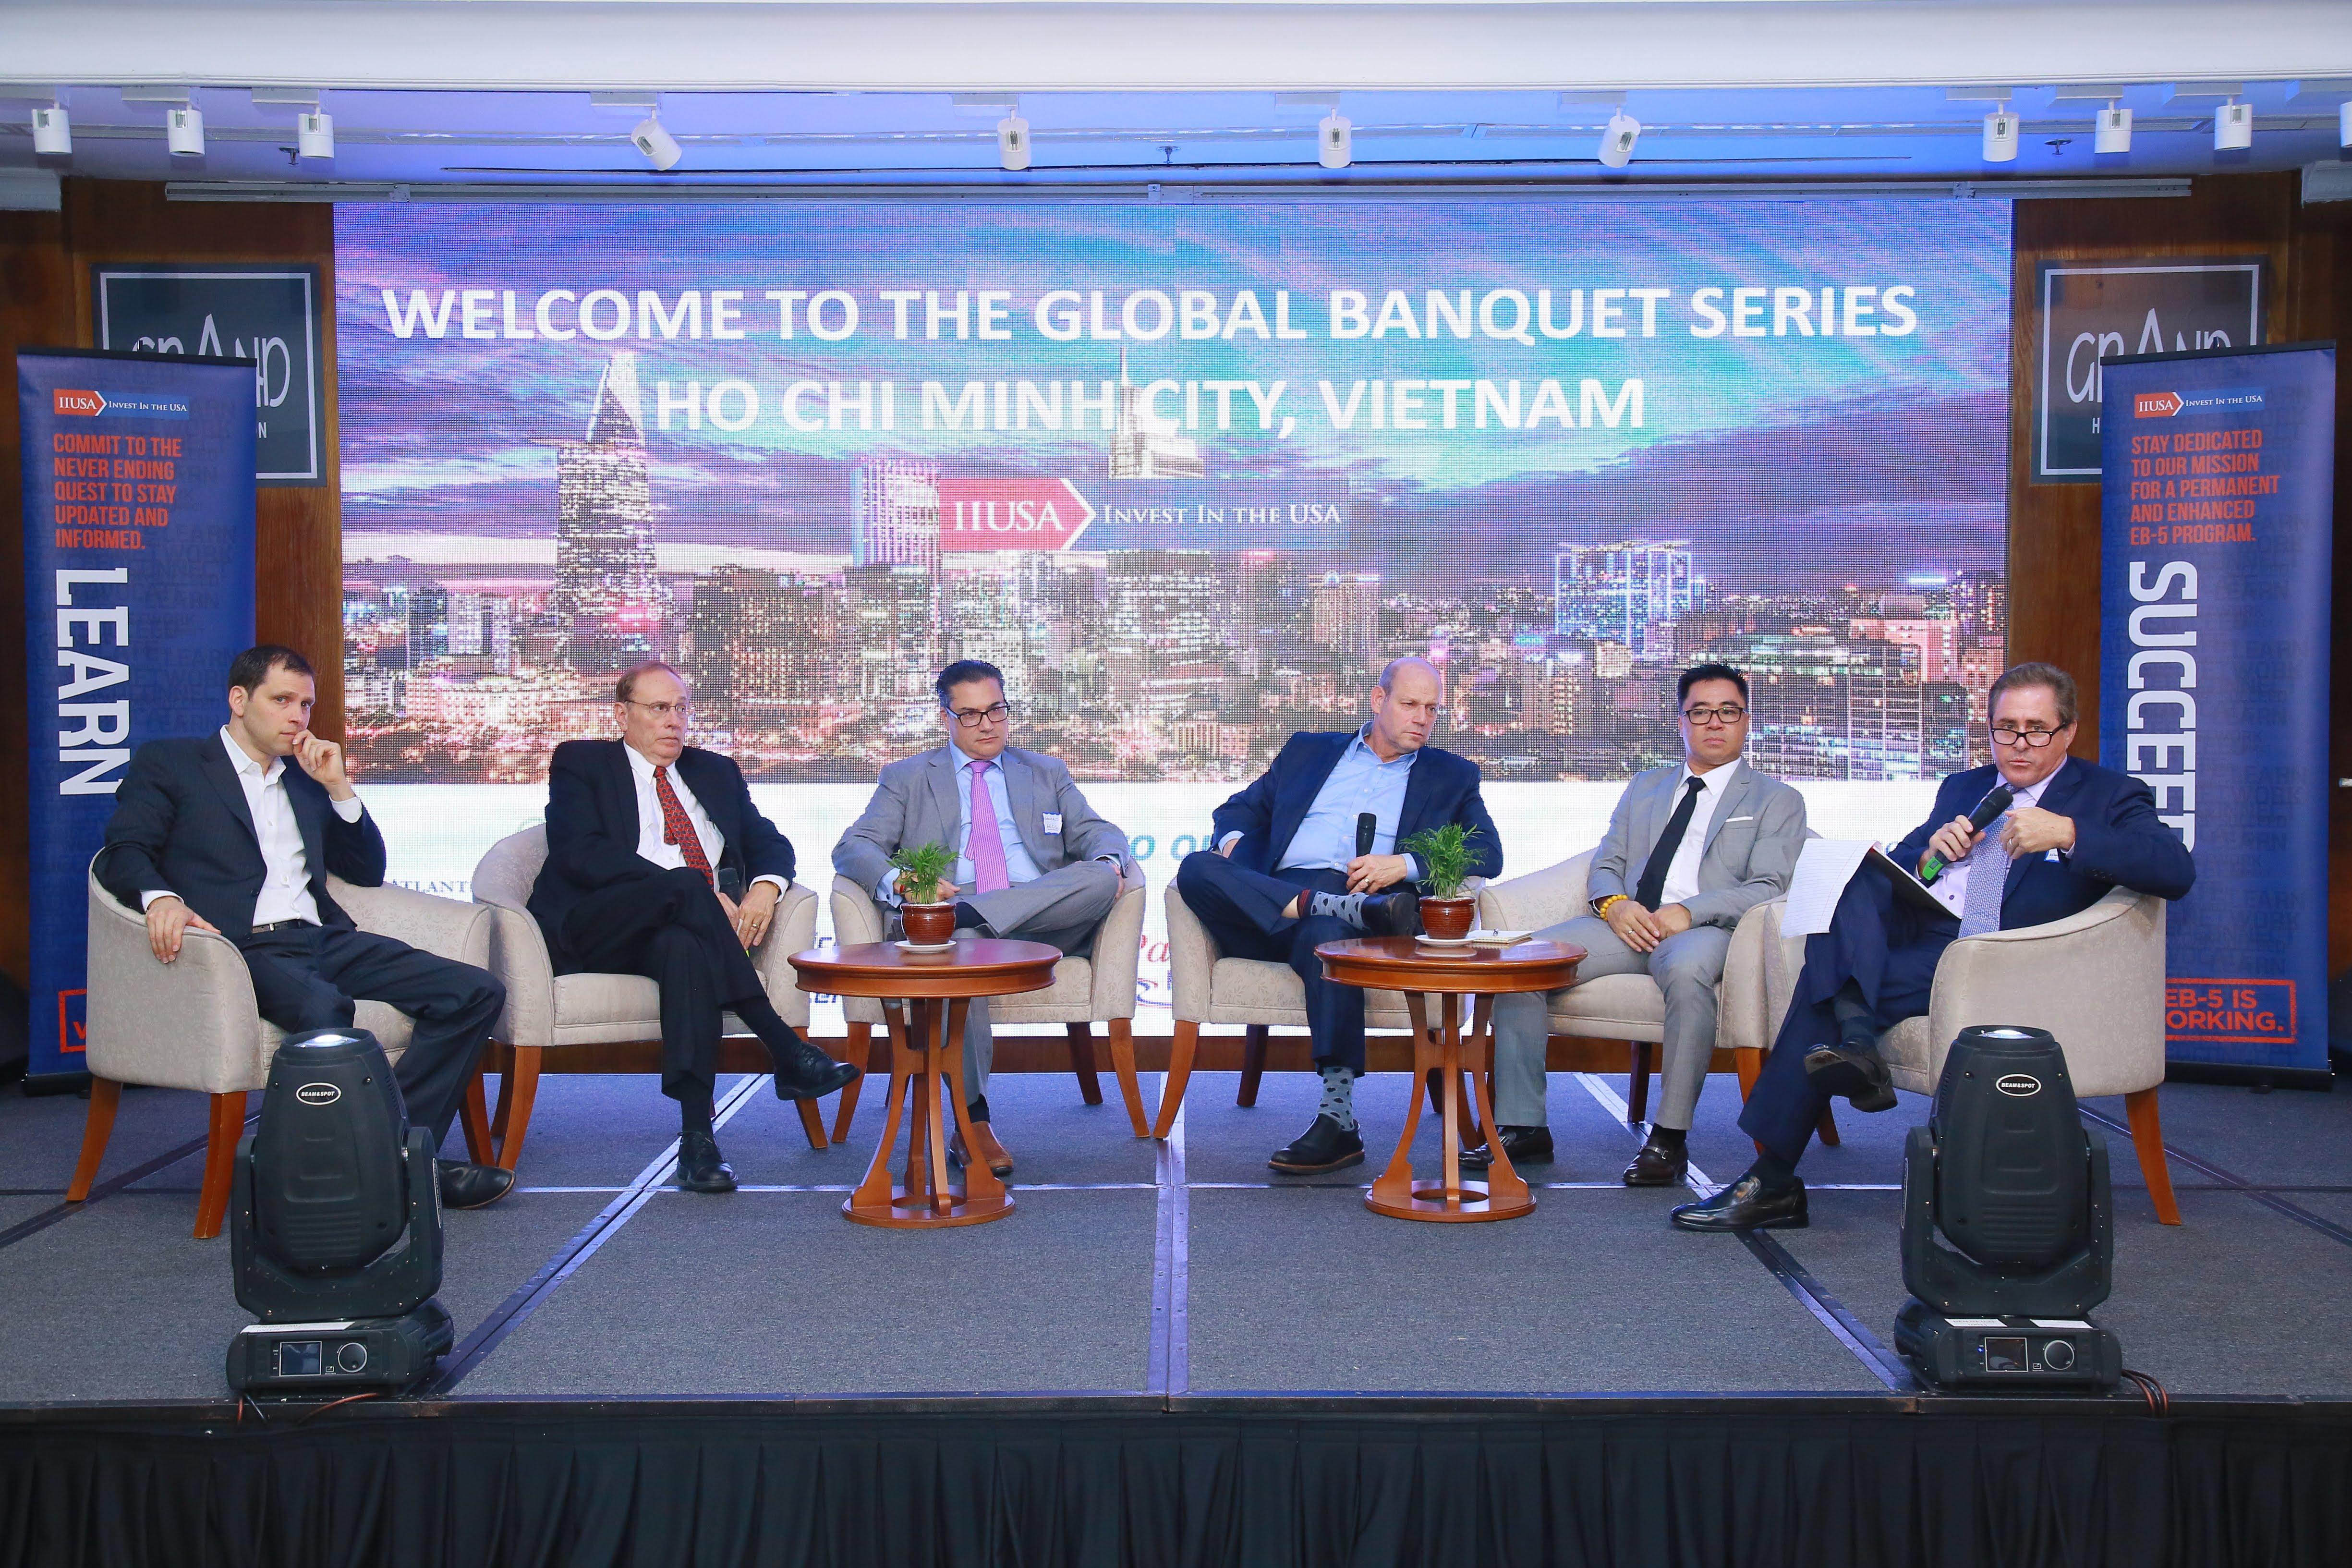 Recent IIUSA Global Banquet Receives Vietnamese Media Coverage